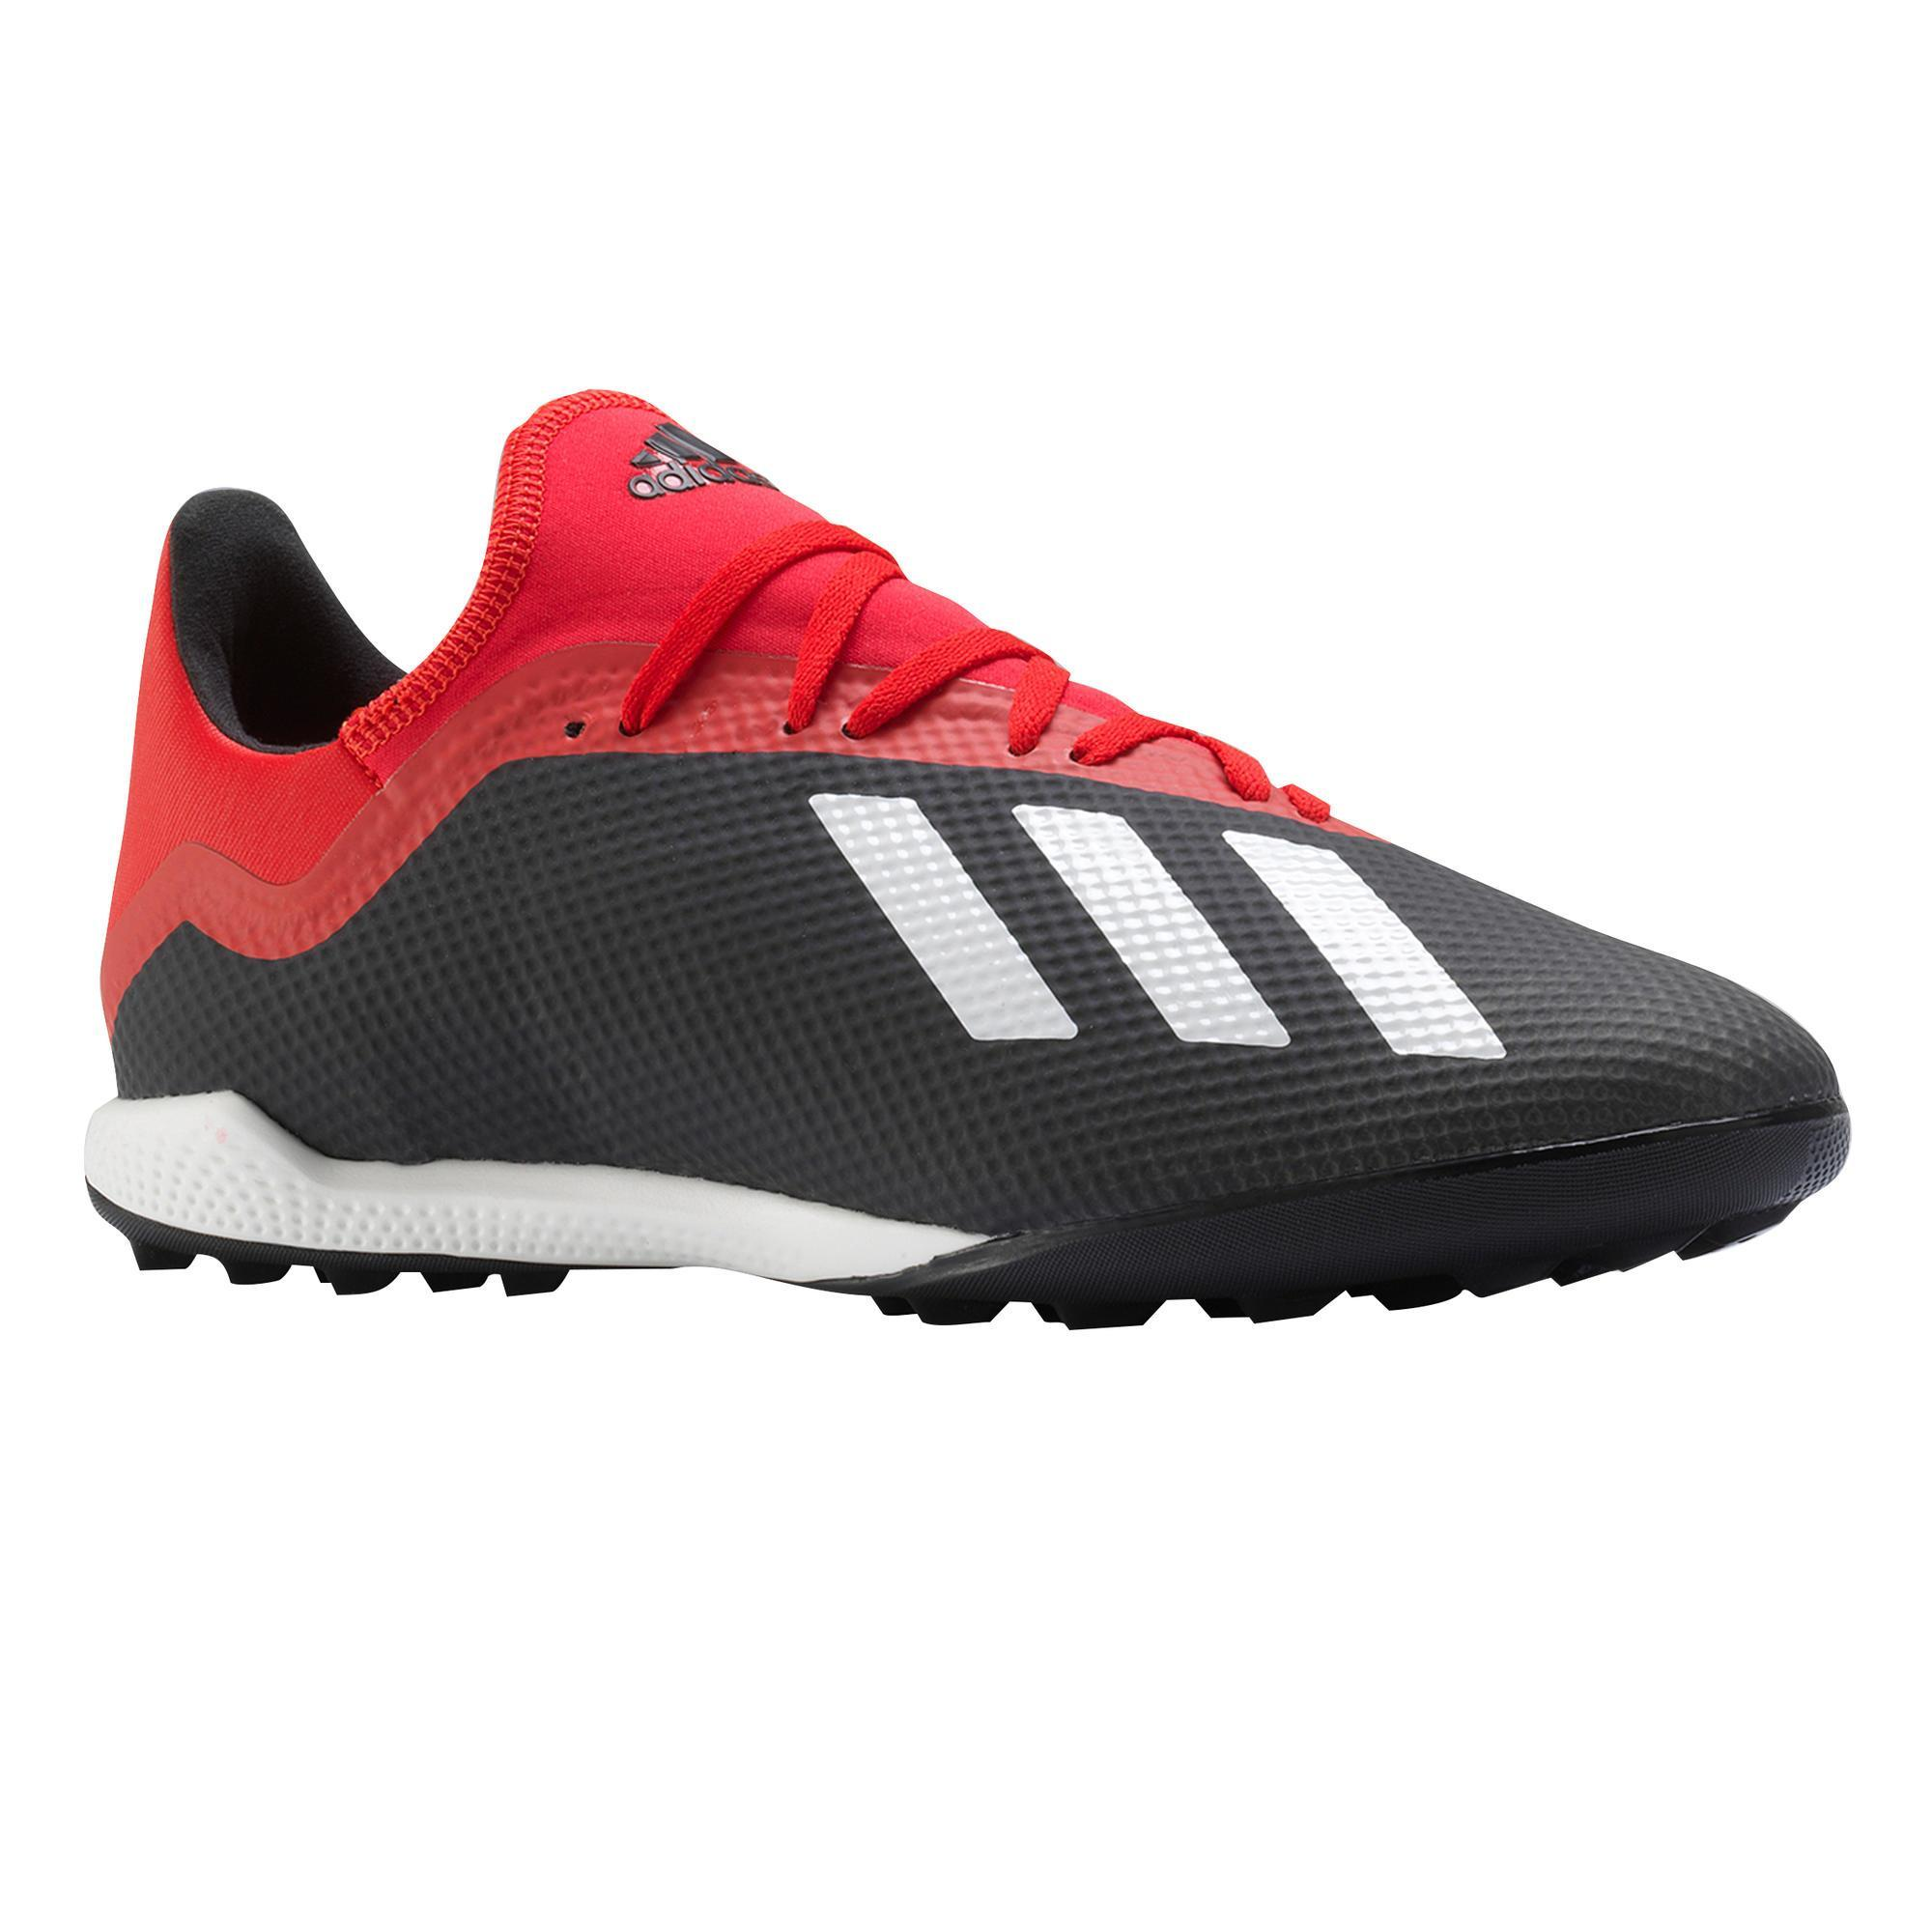 Adidas Voetbalschoenen X Tango 18.3 TF rood/zwart